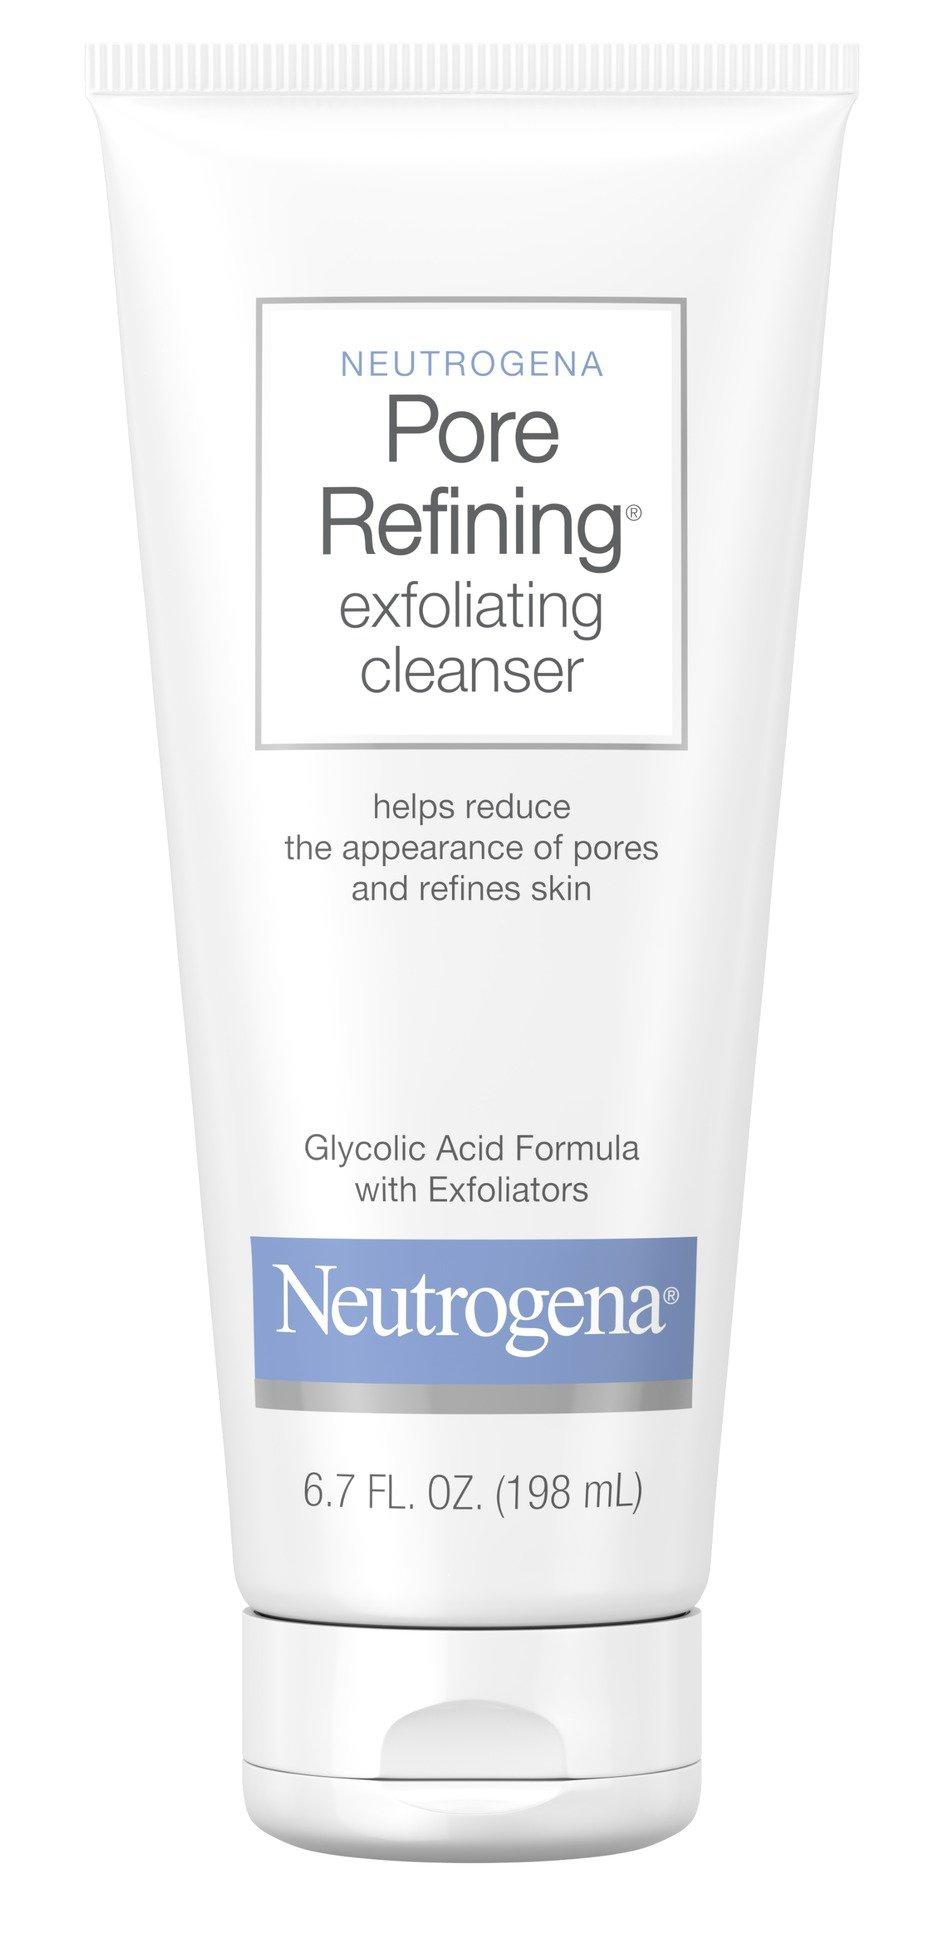 Neutrogena Pore Refining Daily Cleanser